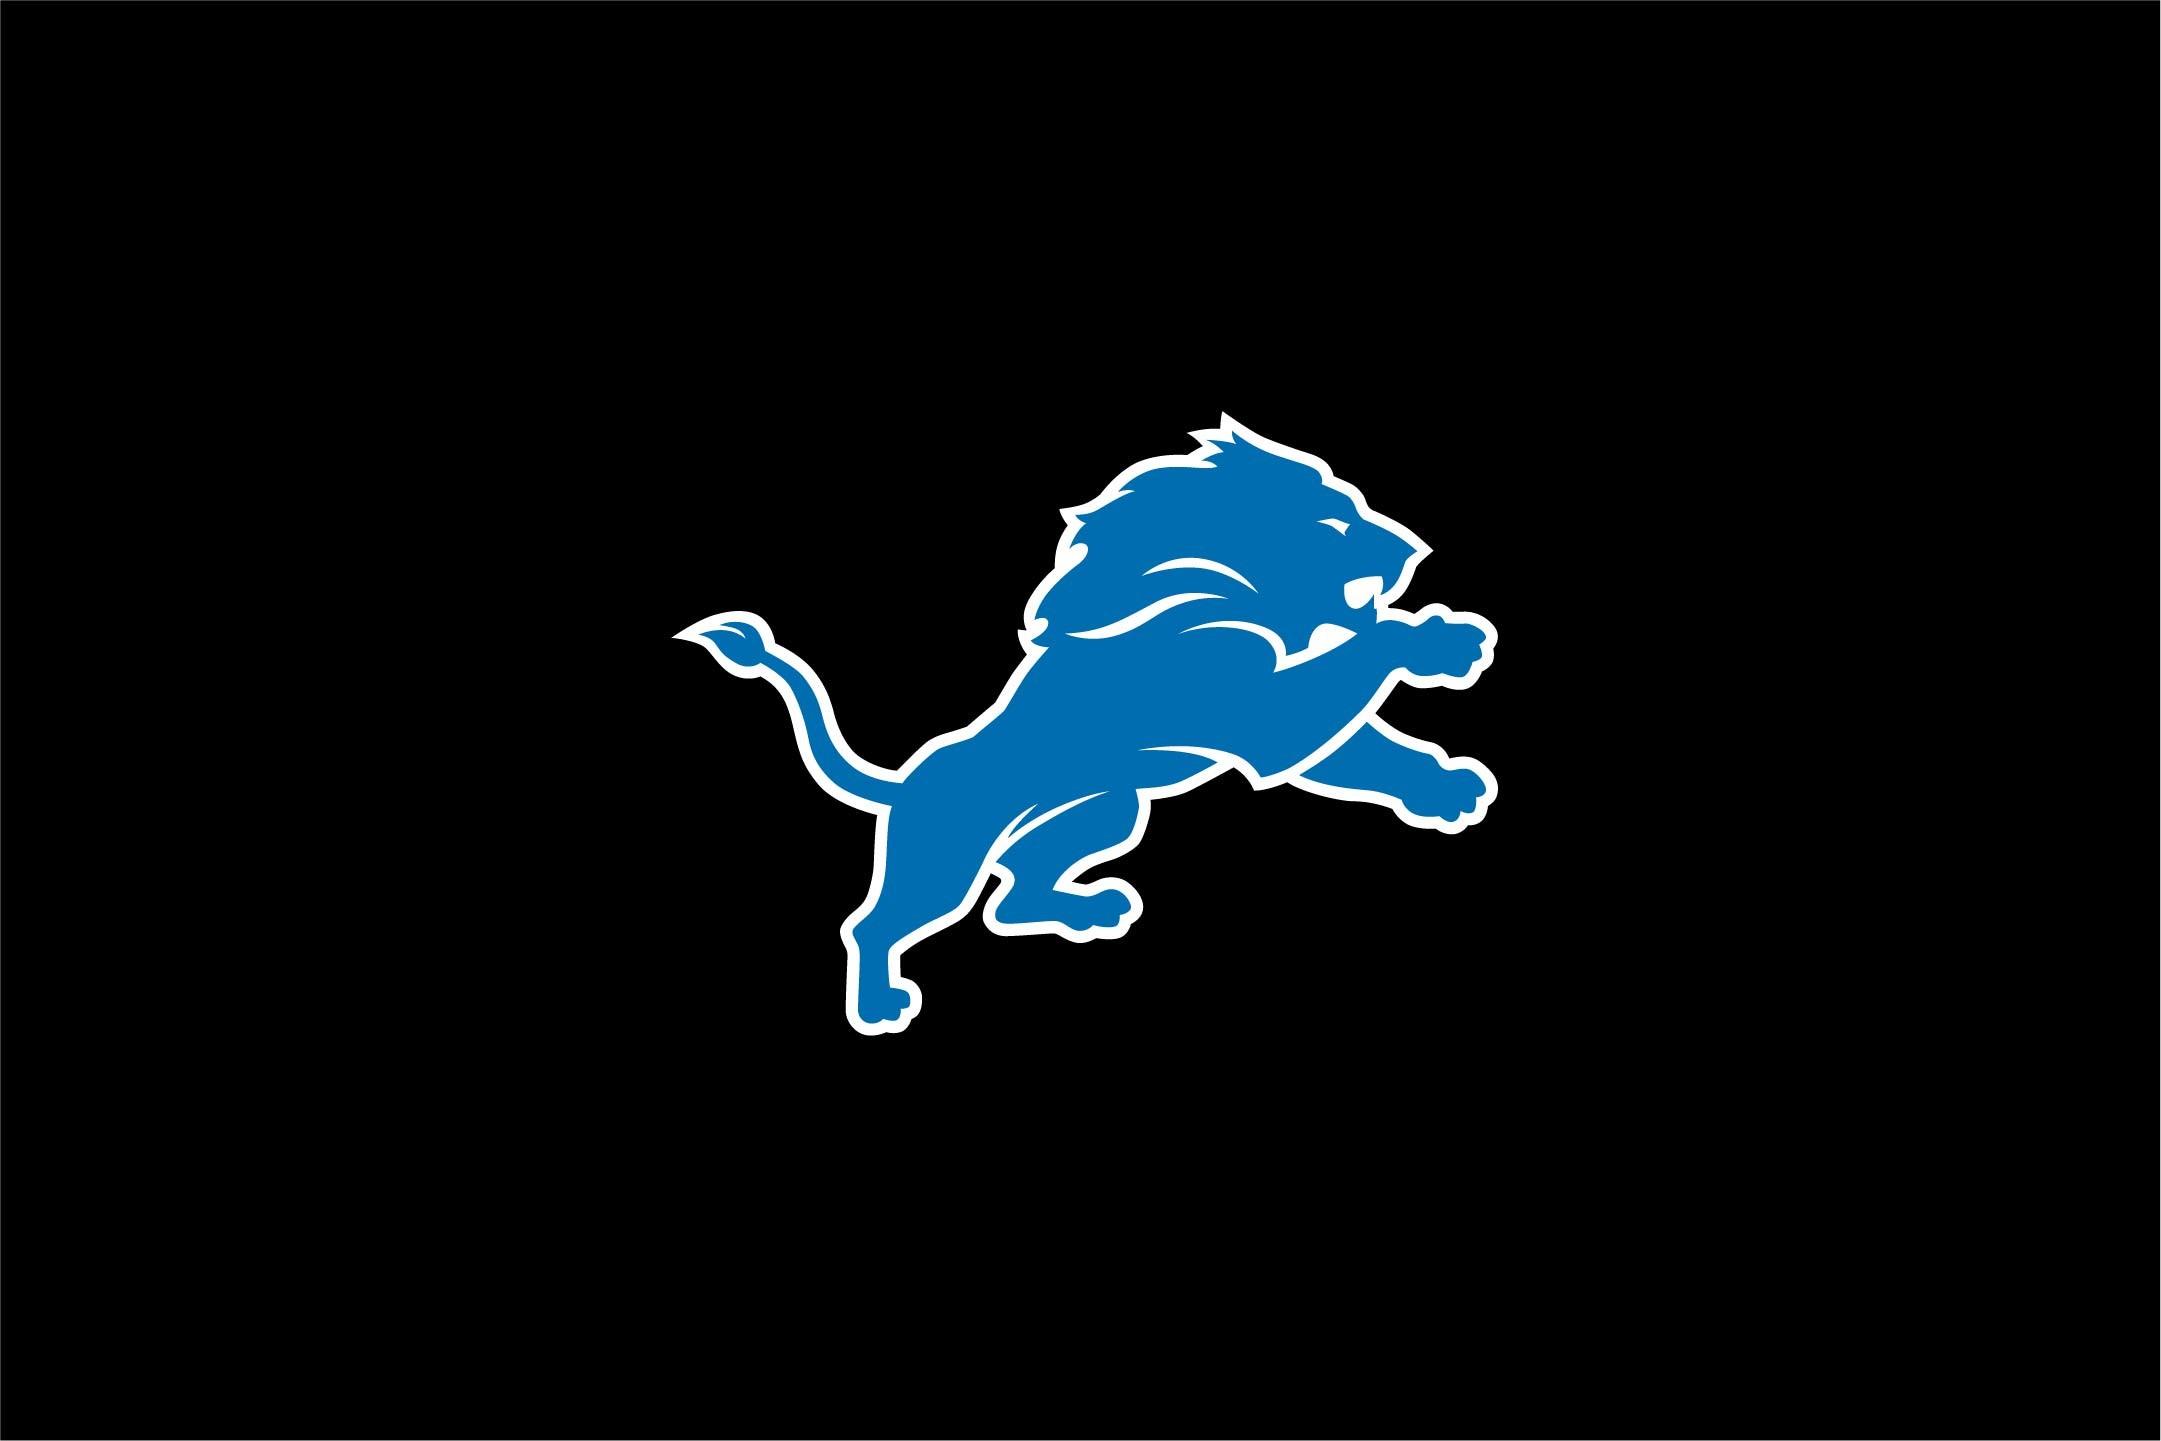 Detroit Lions Wallpaper for iPhone